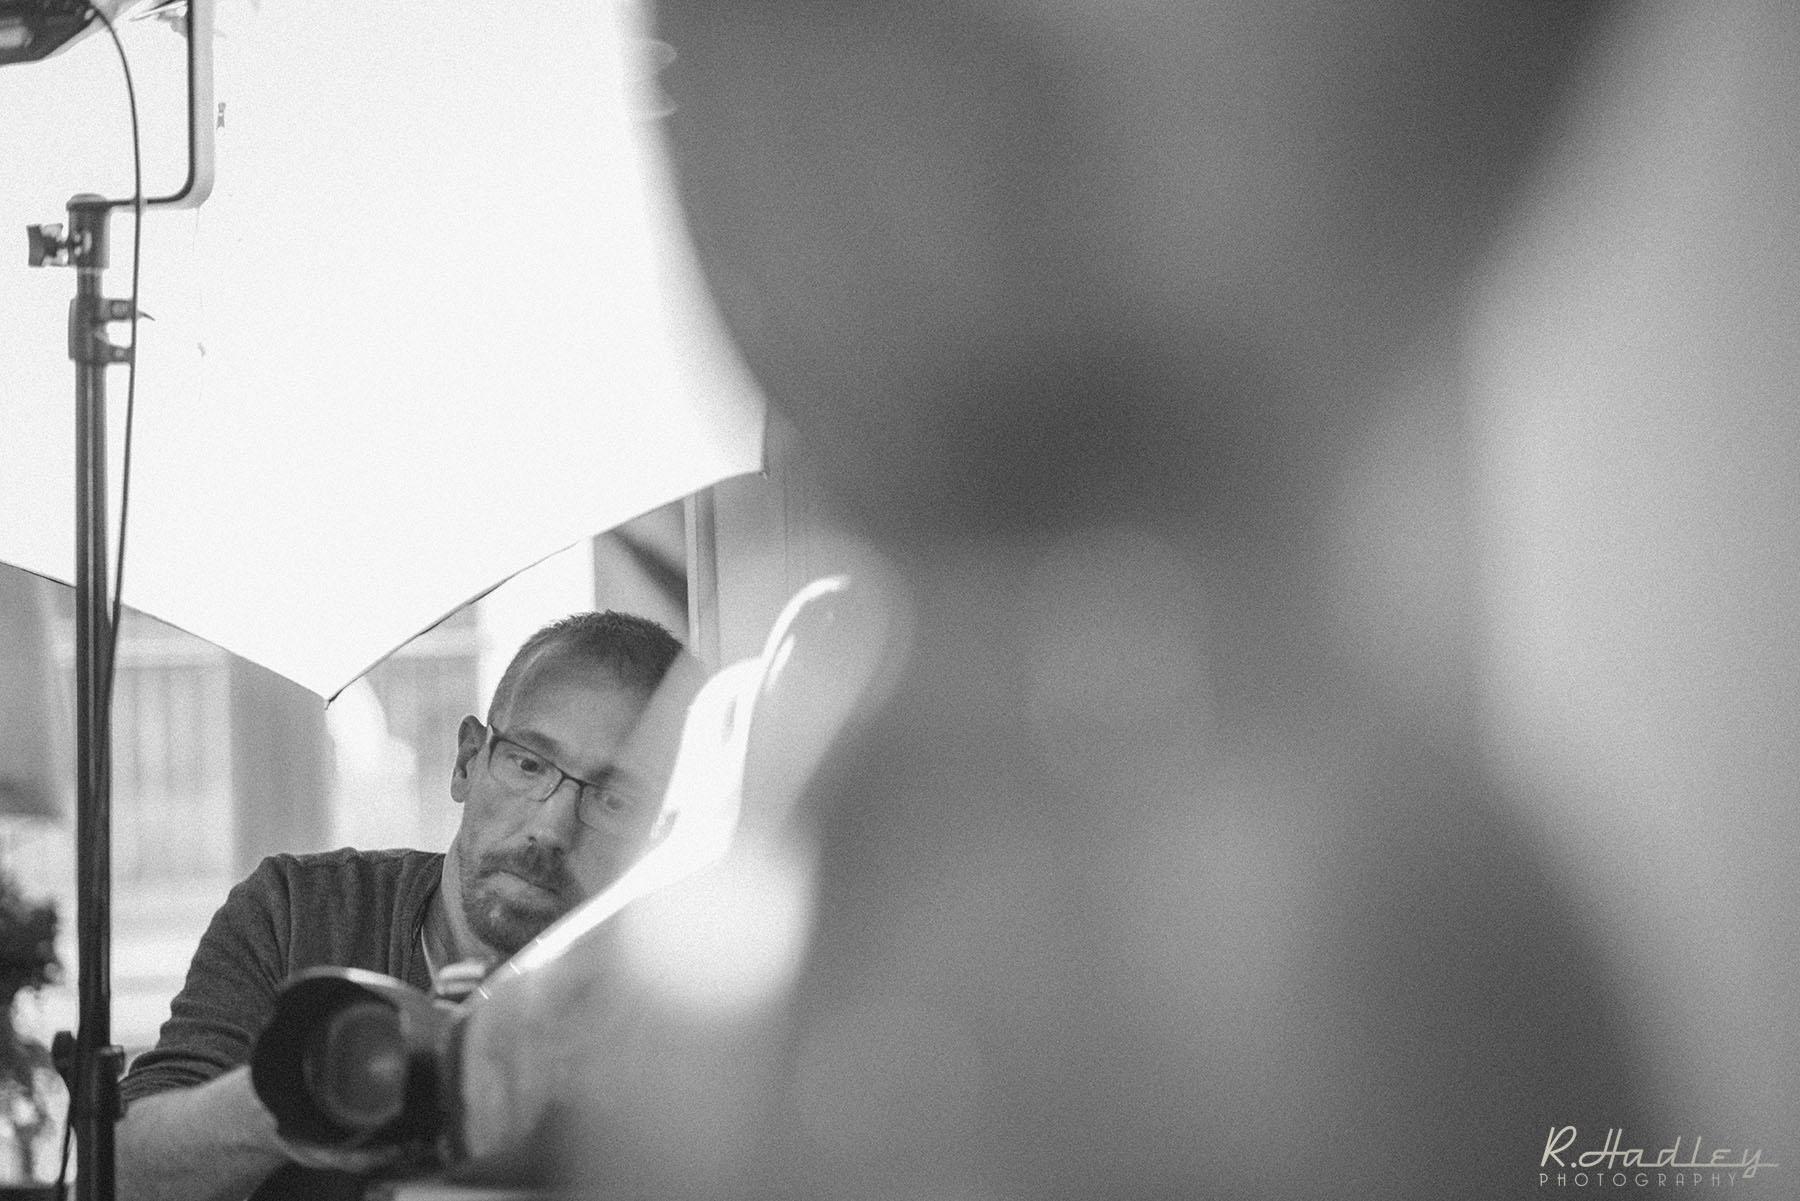 Xavi Montojo Jordan - On Set Photographer for Carolina De Santis film production at Salon Toro, Barcelona